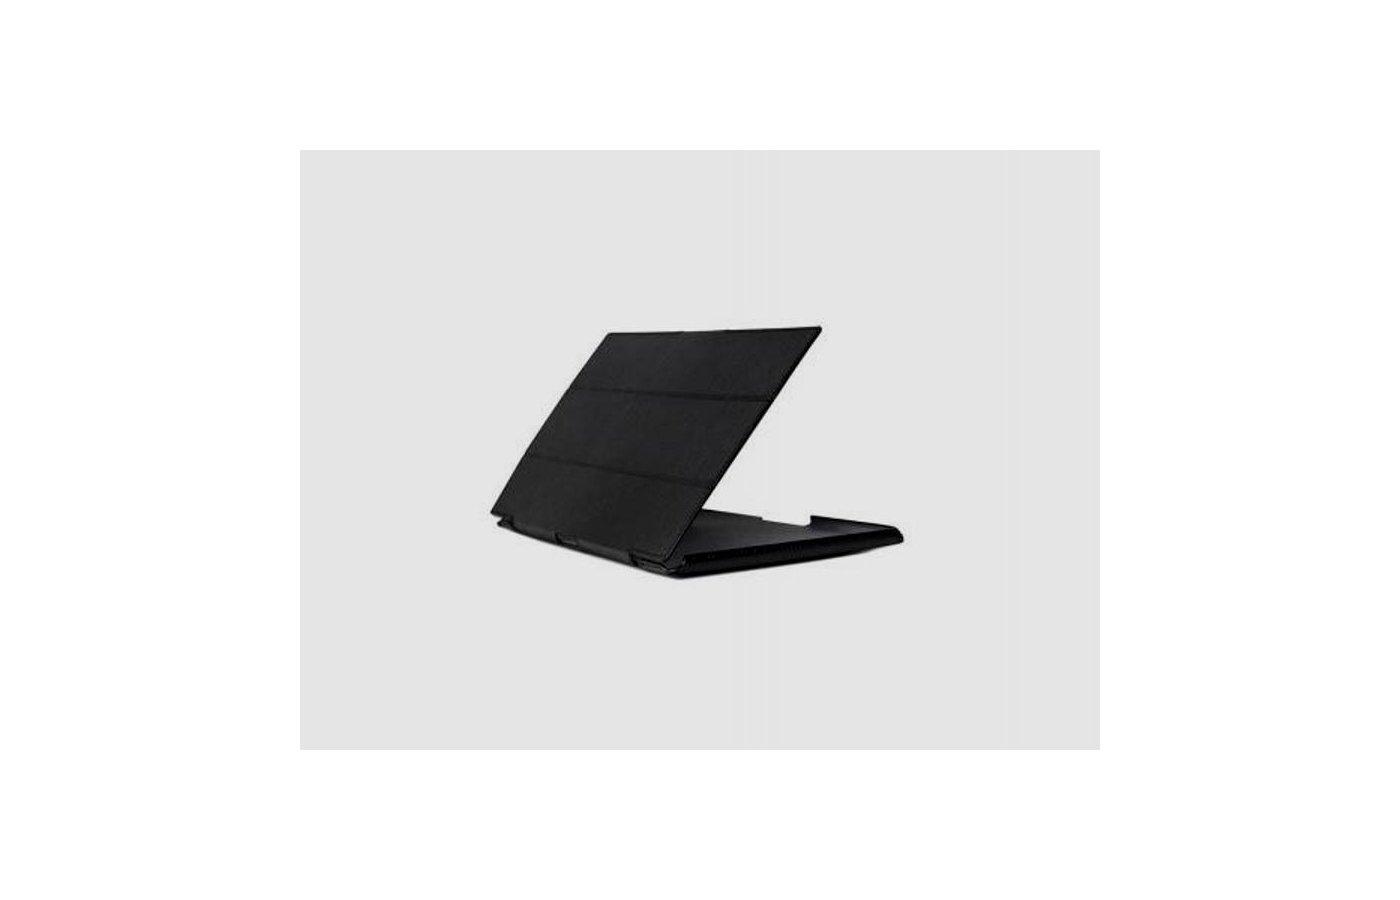 Чехол для планшетного ПК Muvit for Xperia Rotary Stand для Sony Tablet Z2 кожа, черный